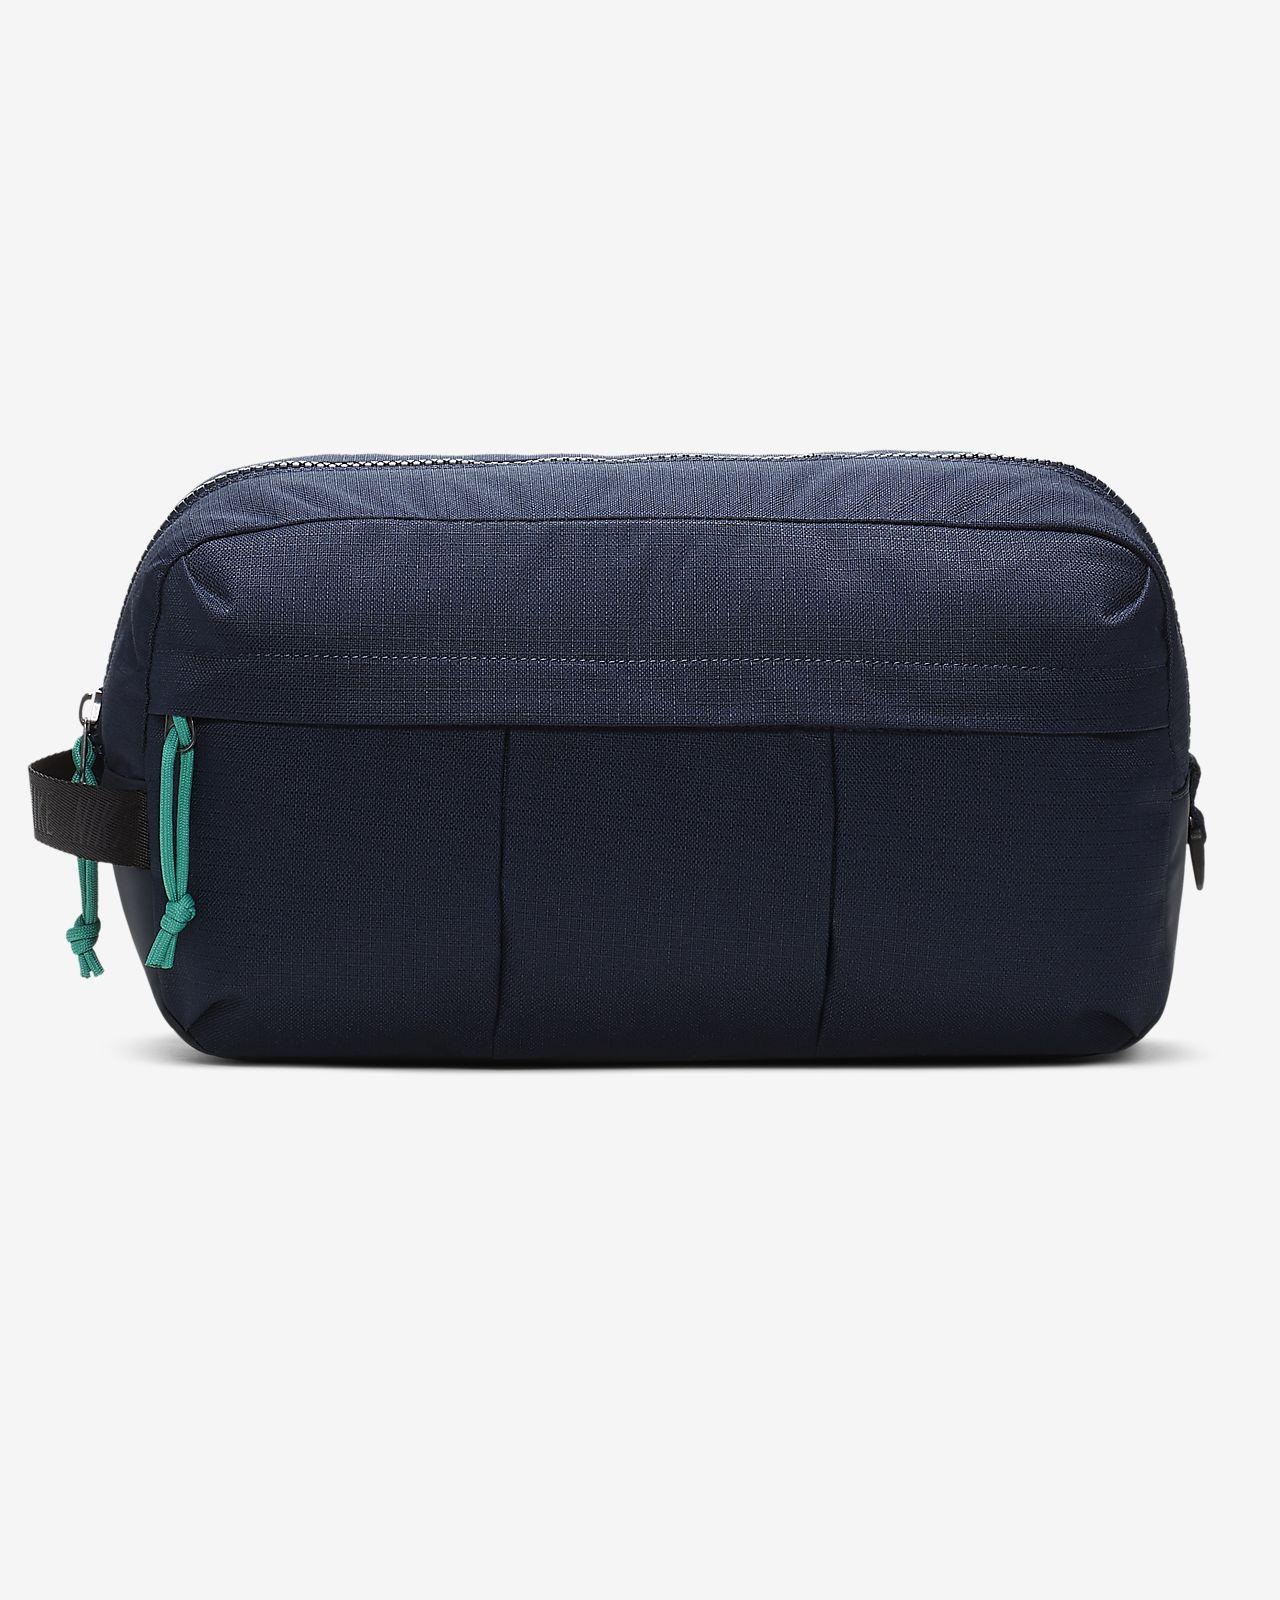 Nike Sport Shoe Bag